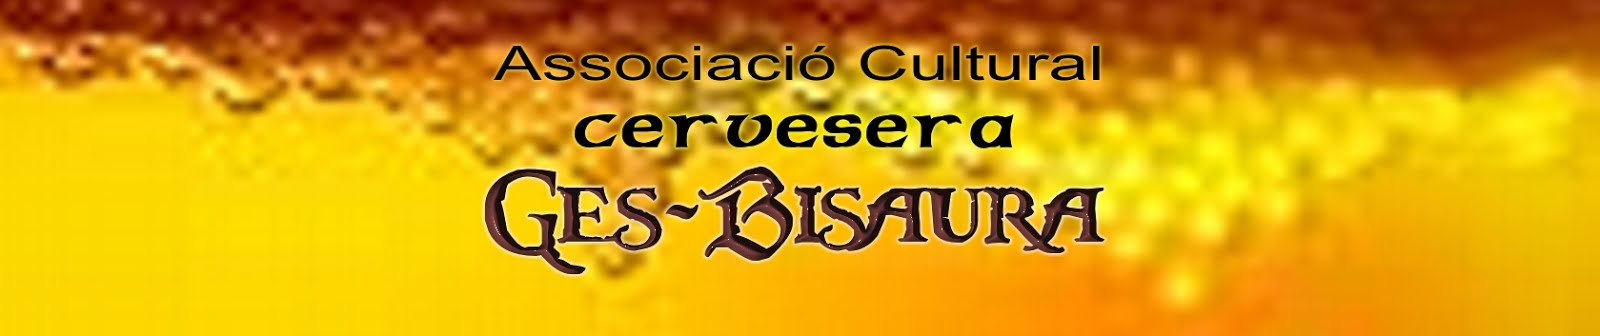 A.C. Cervesera                              Ges - Bisaura